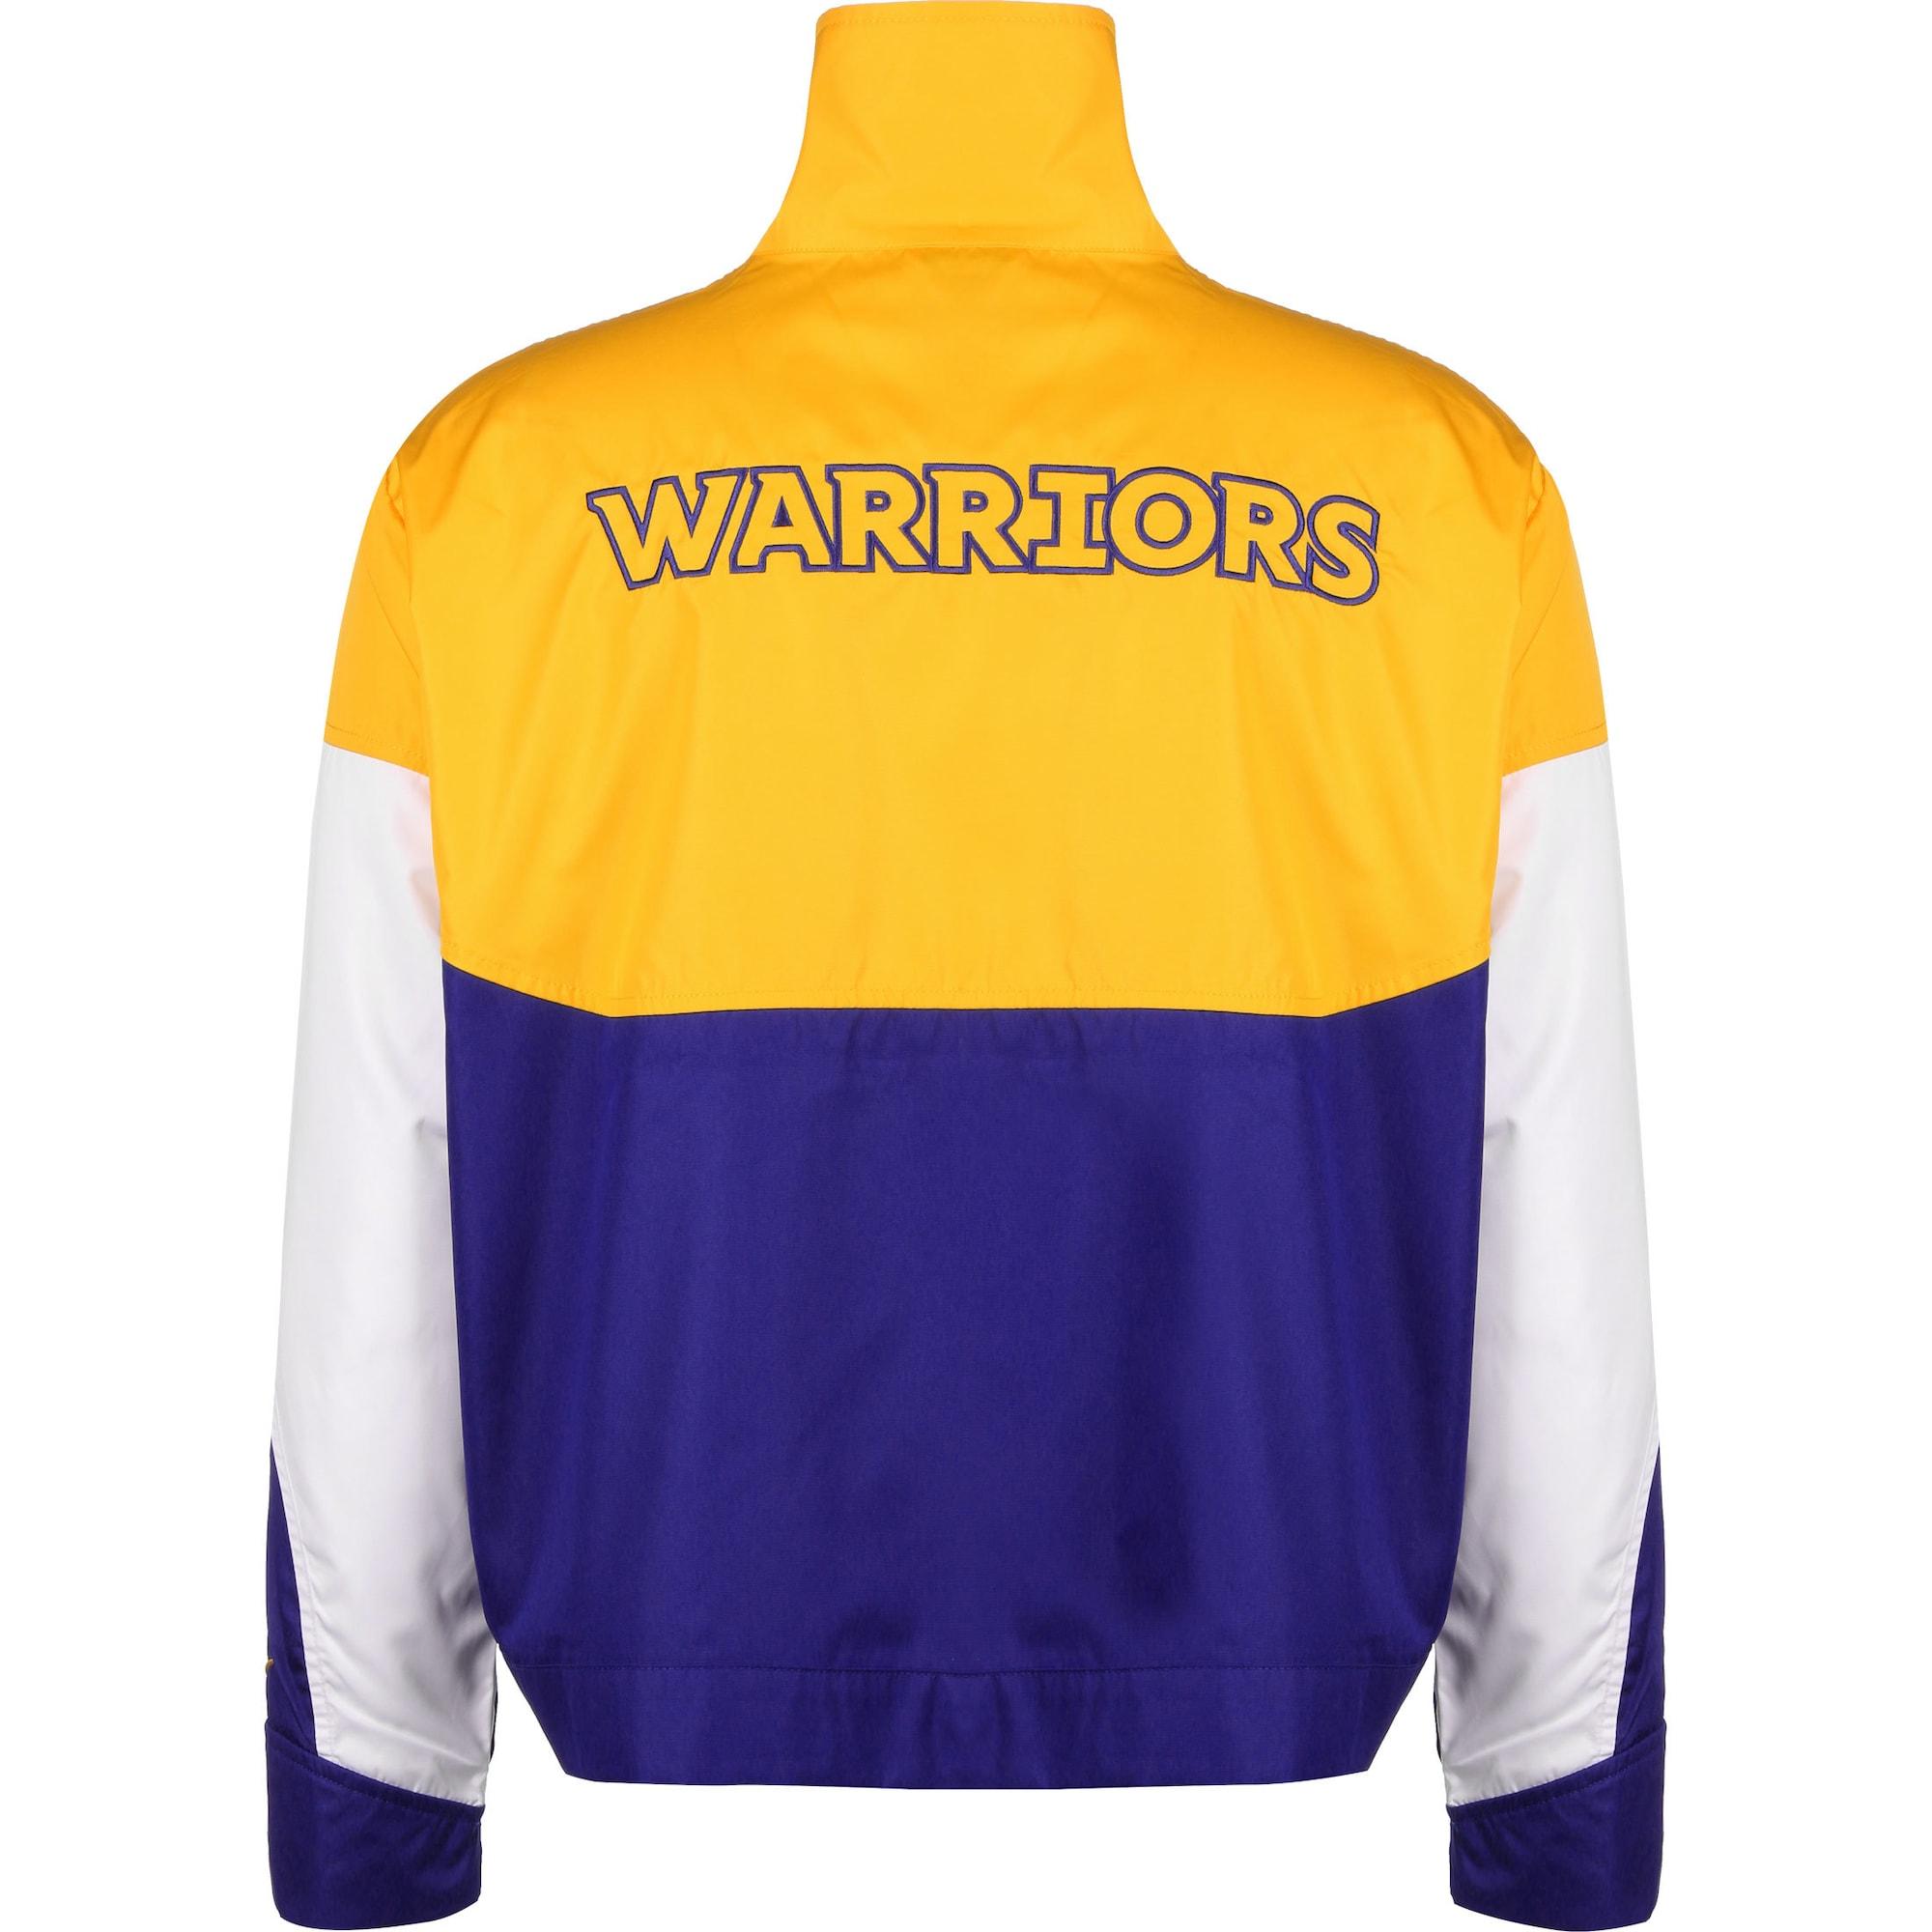 nike - Trainingsjacke 'Golden State Warriors'